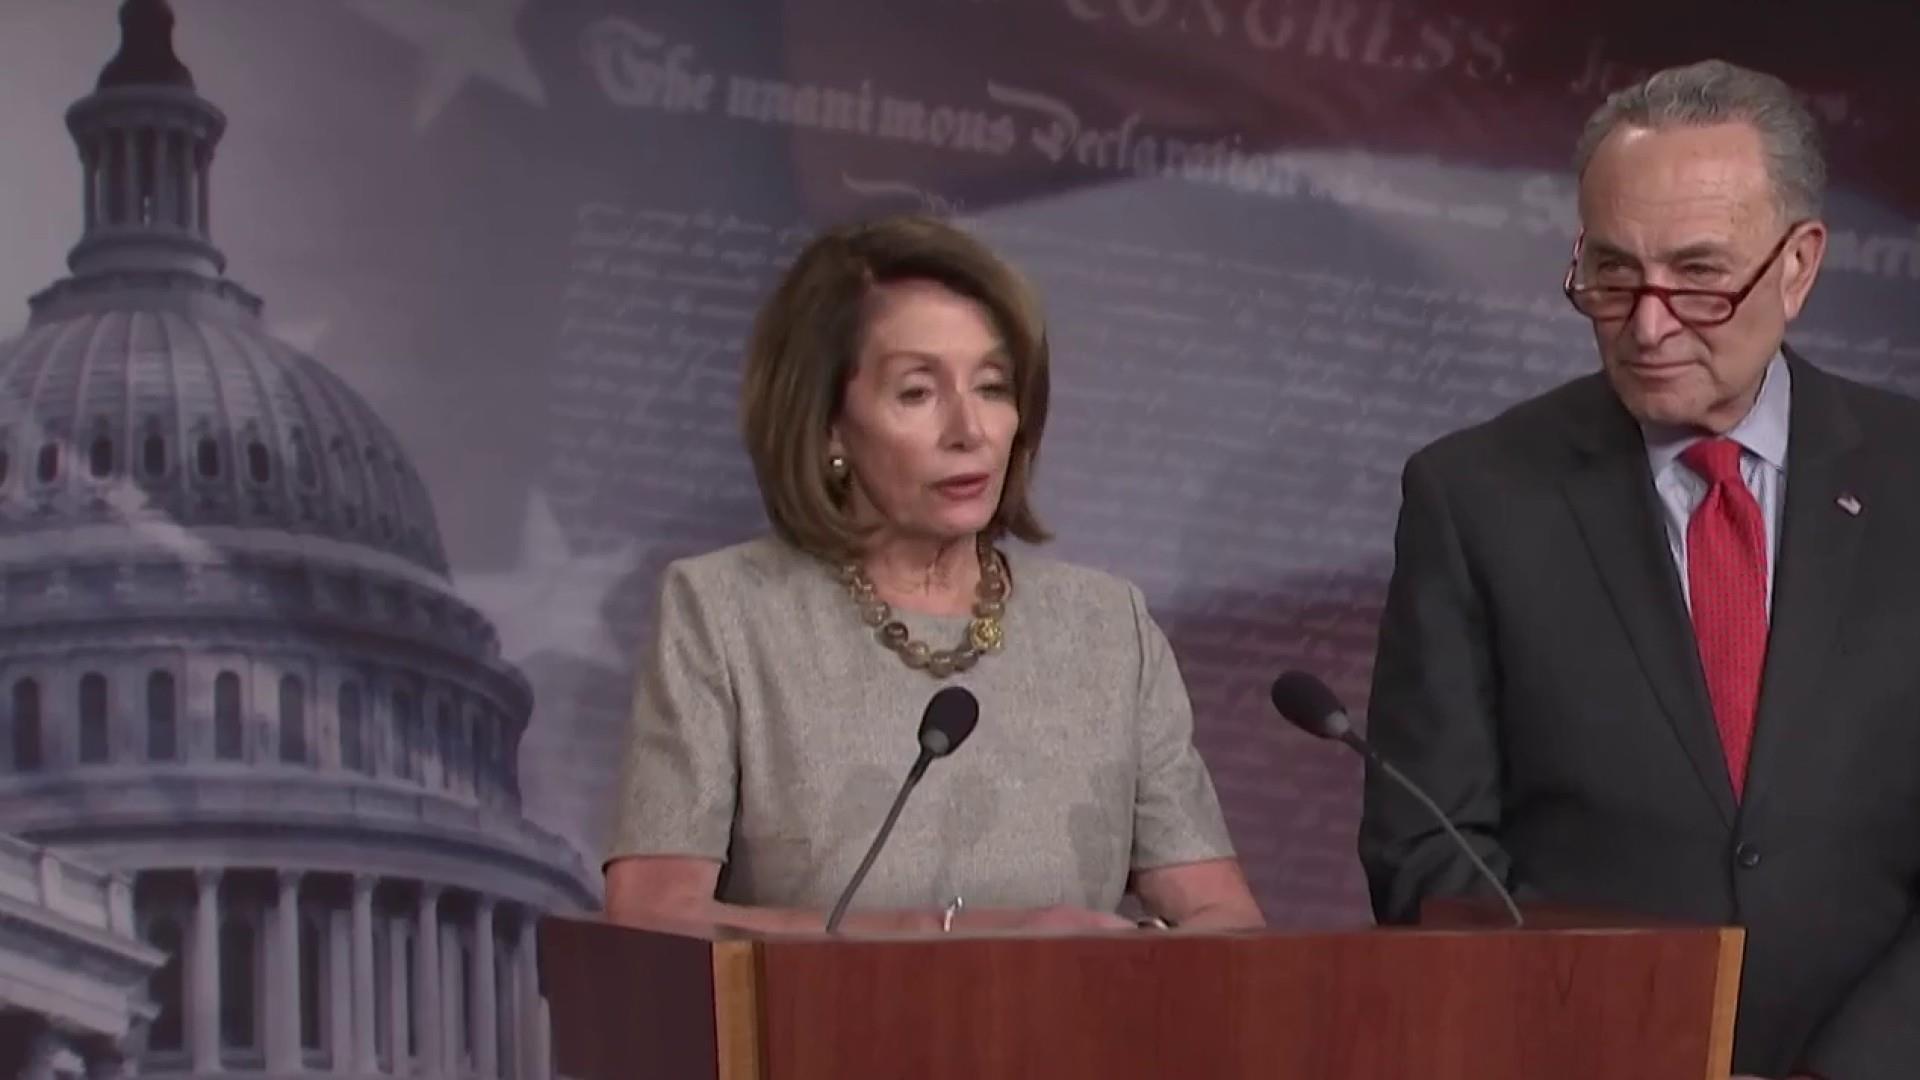 Congress approves measure ending government shutdown